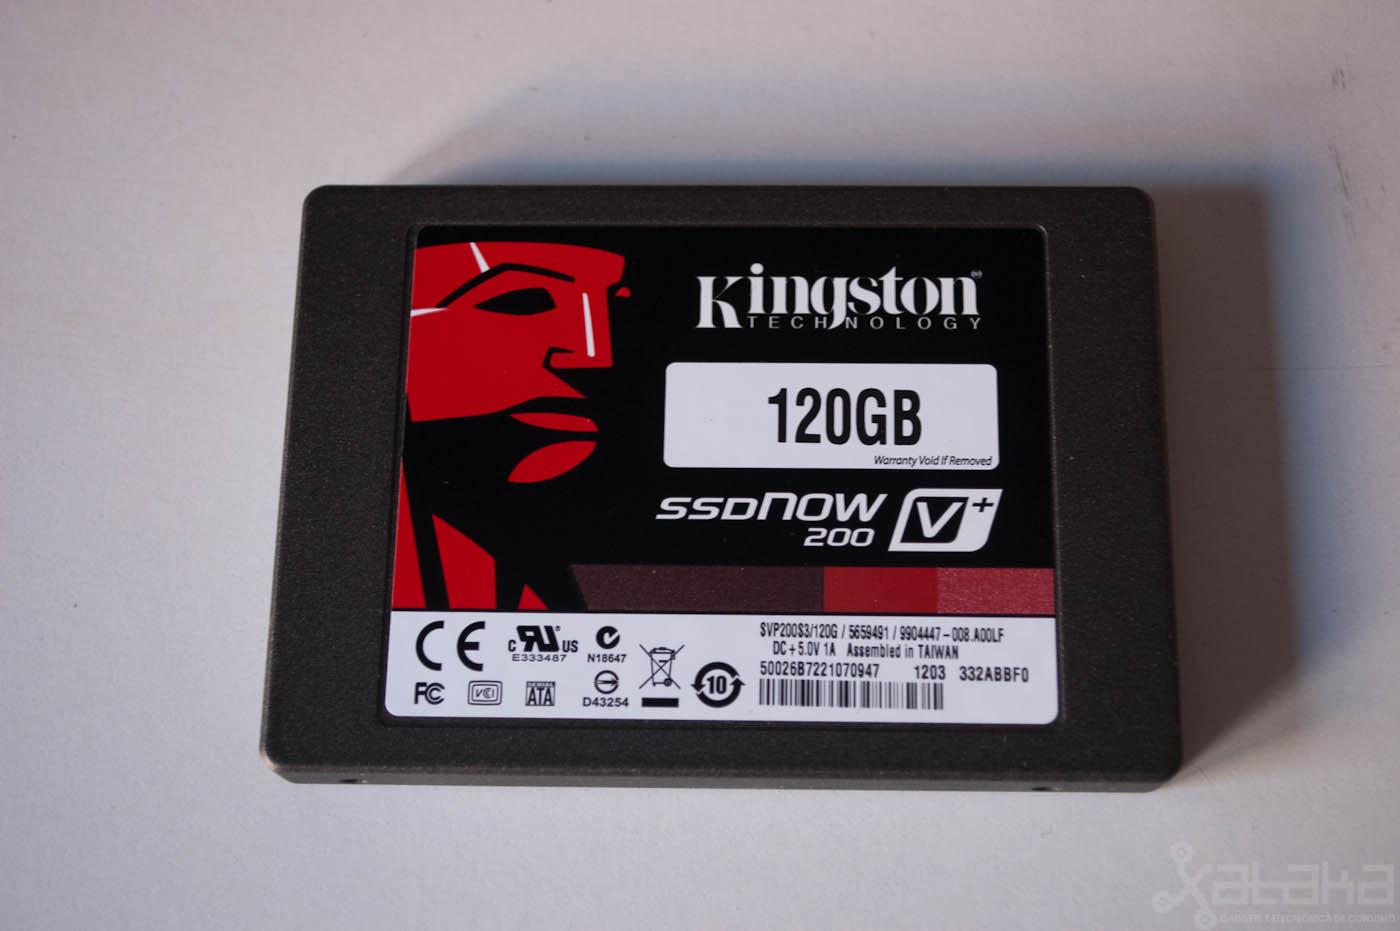 Kingston SSDNow V+200, análisis